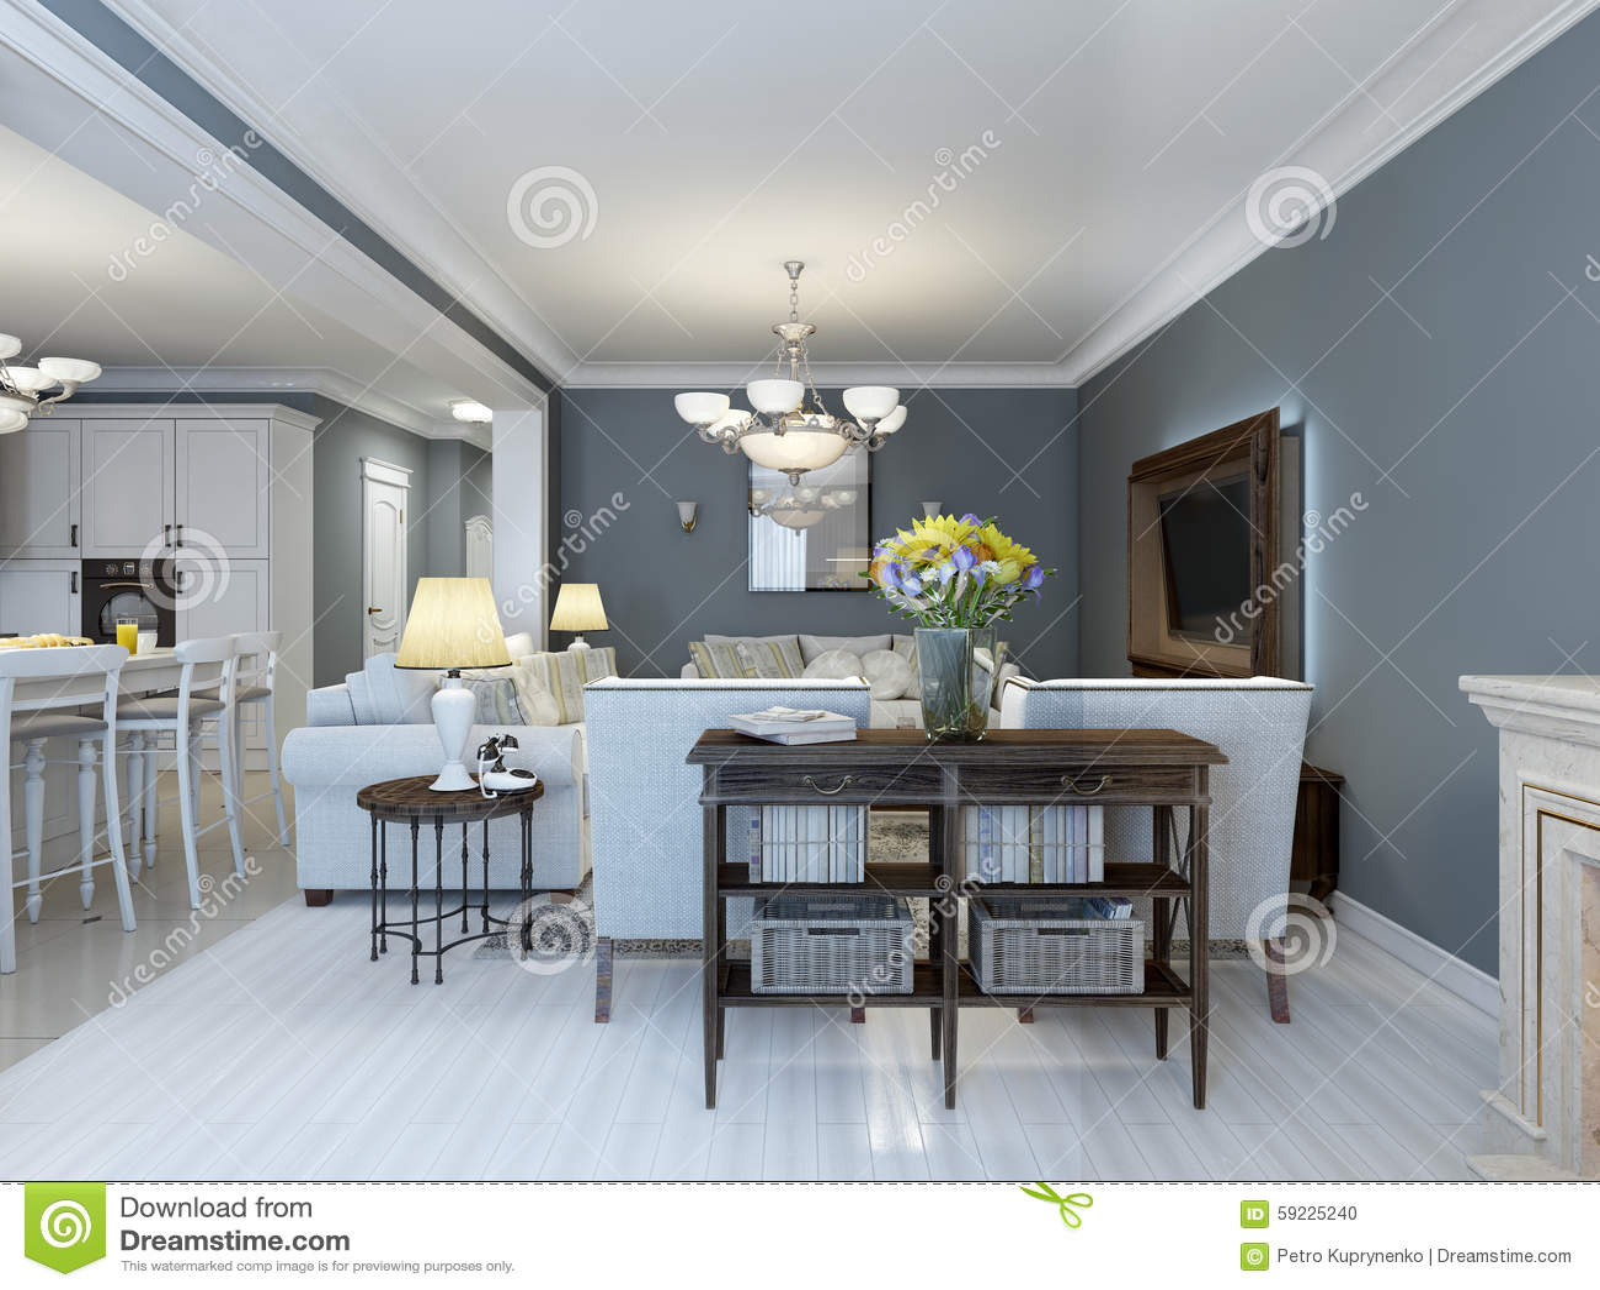 Idé av det provence sovrummet med vitt möblemang